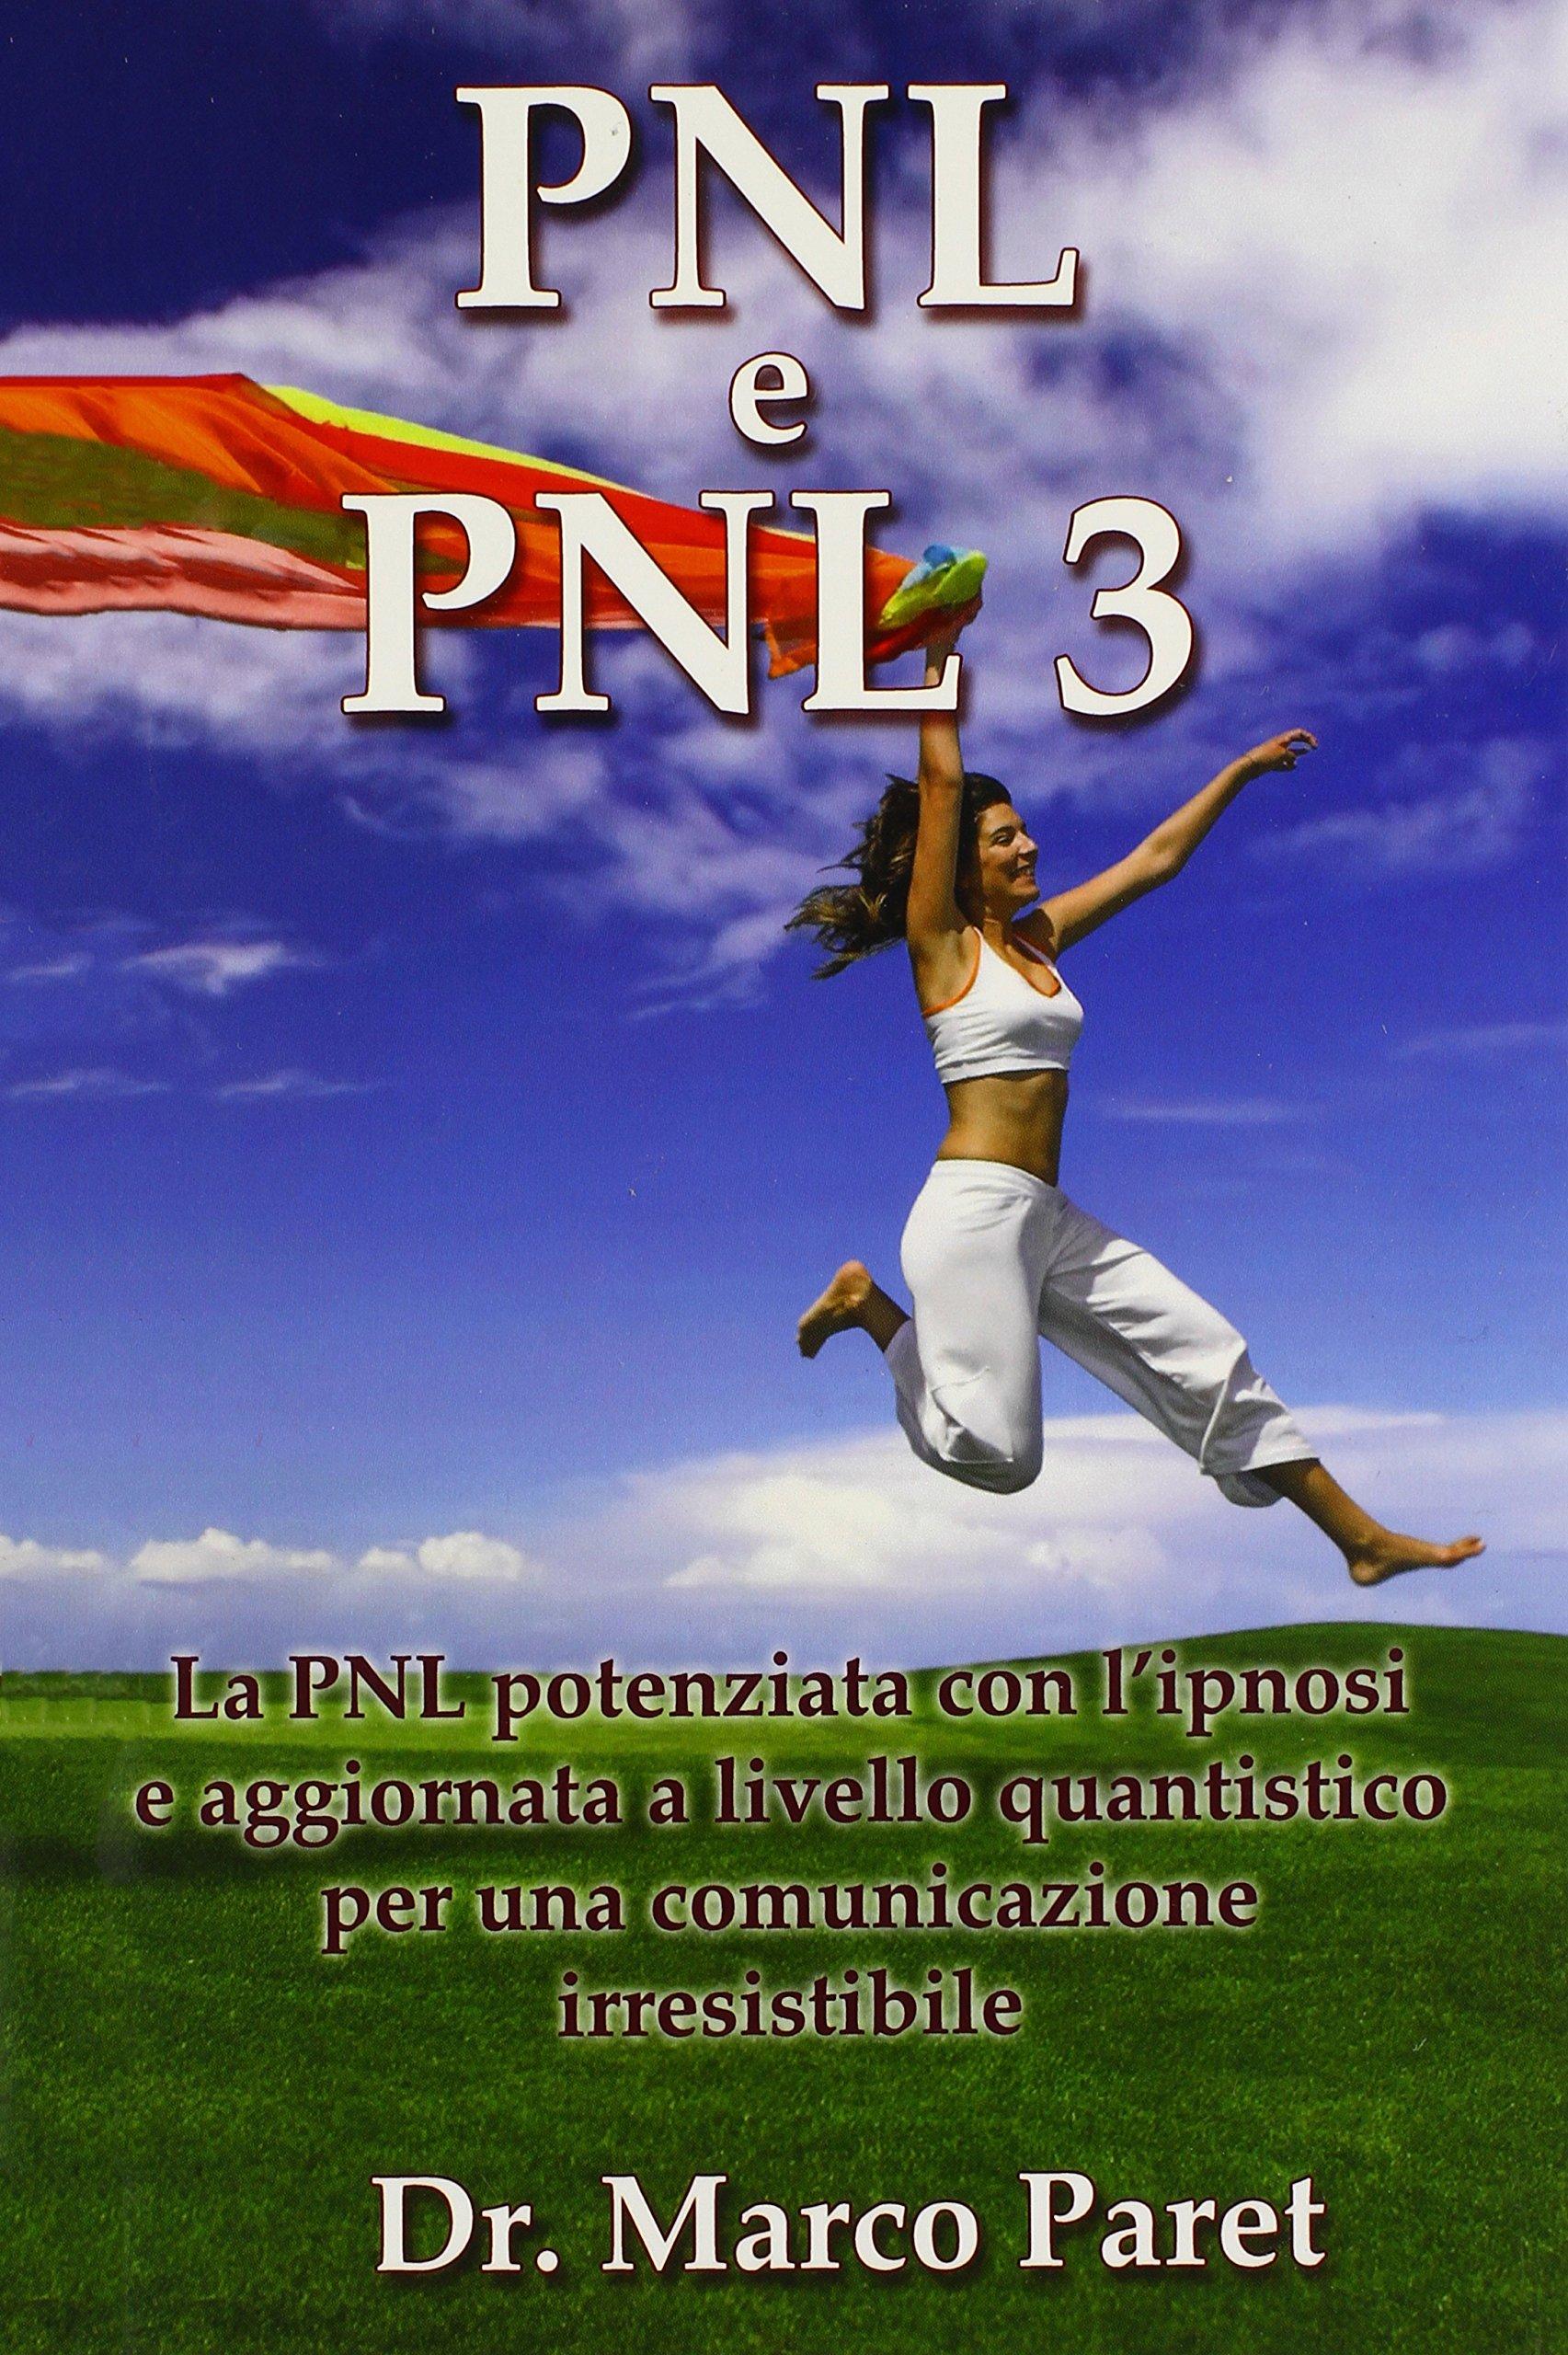 PNL e PNL3 (Italian Edition): MARCO PARET: 9780935410242: Amazon.com ...